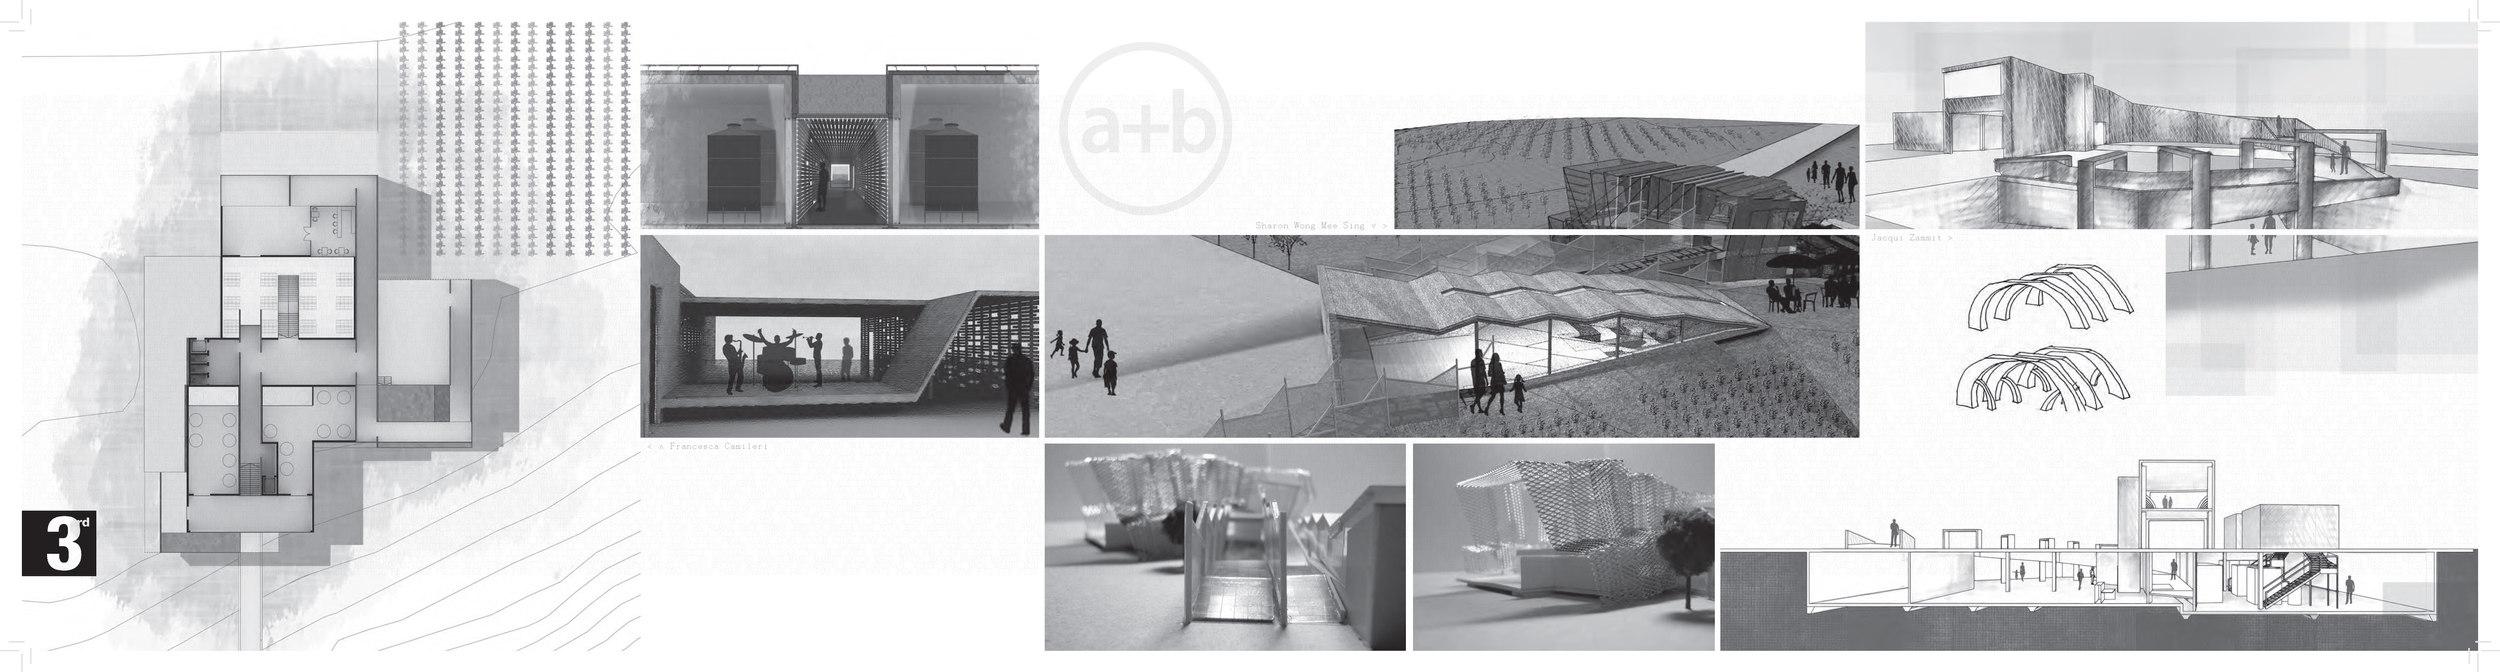 a+bJournal2010-web_Page_17.jpg